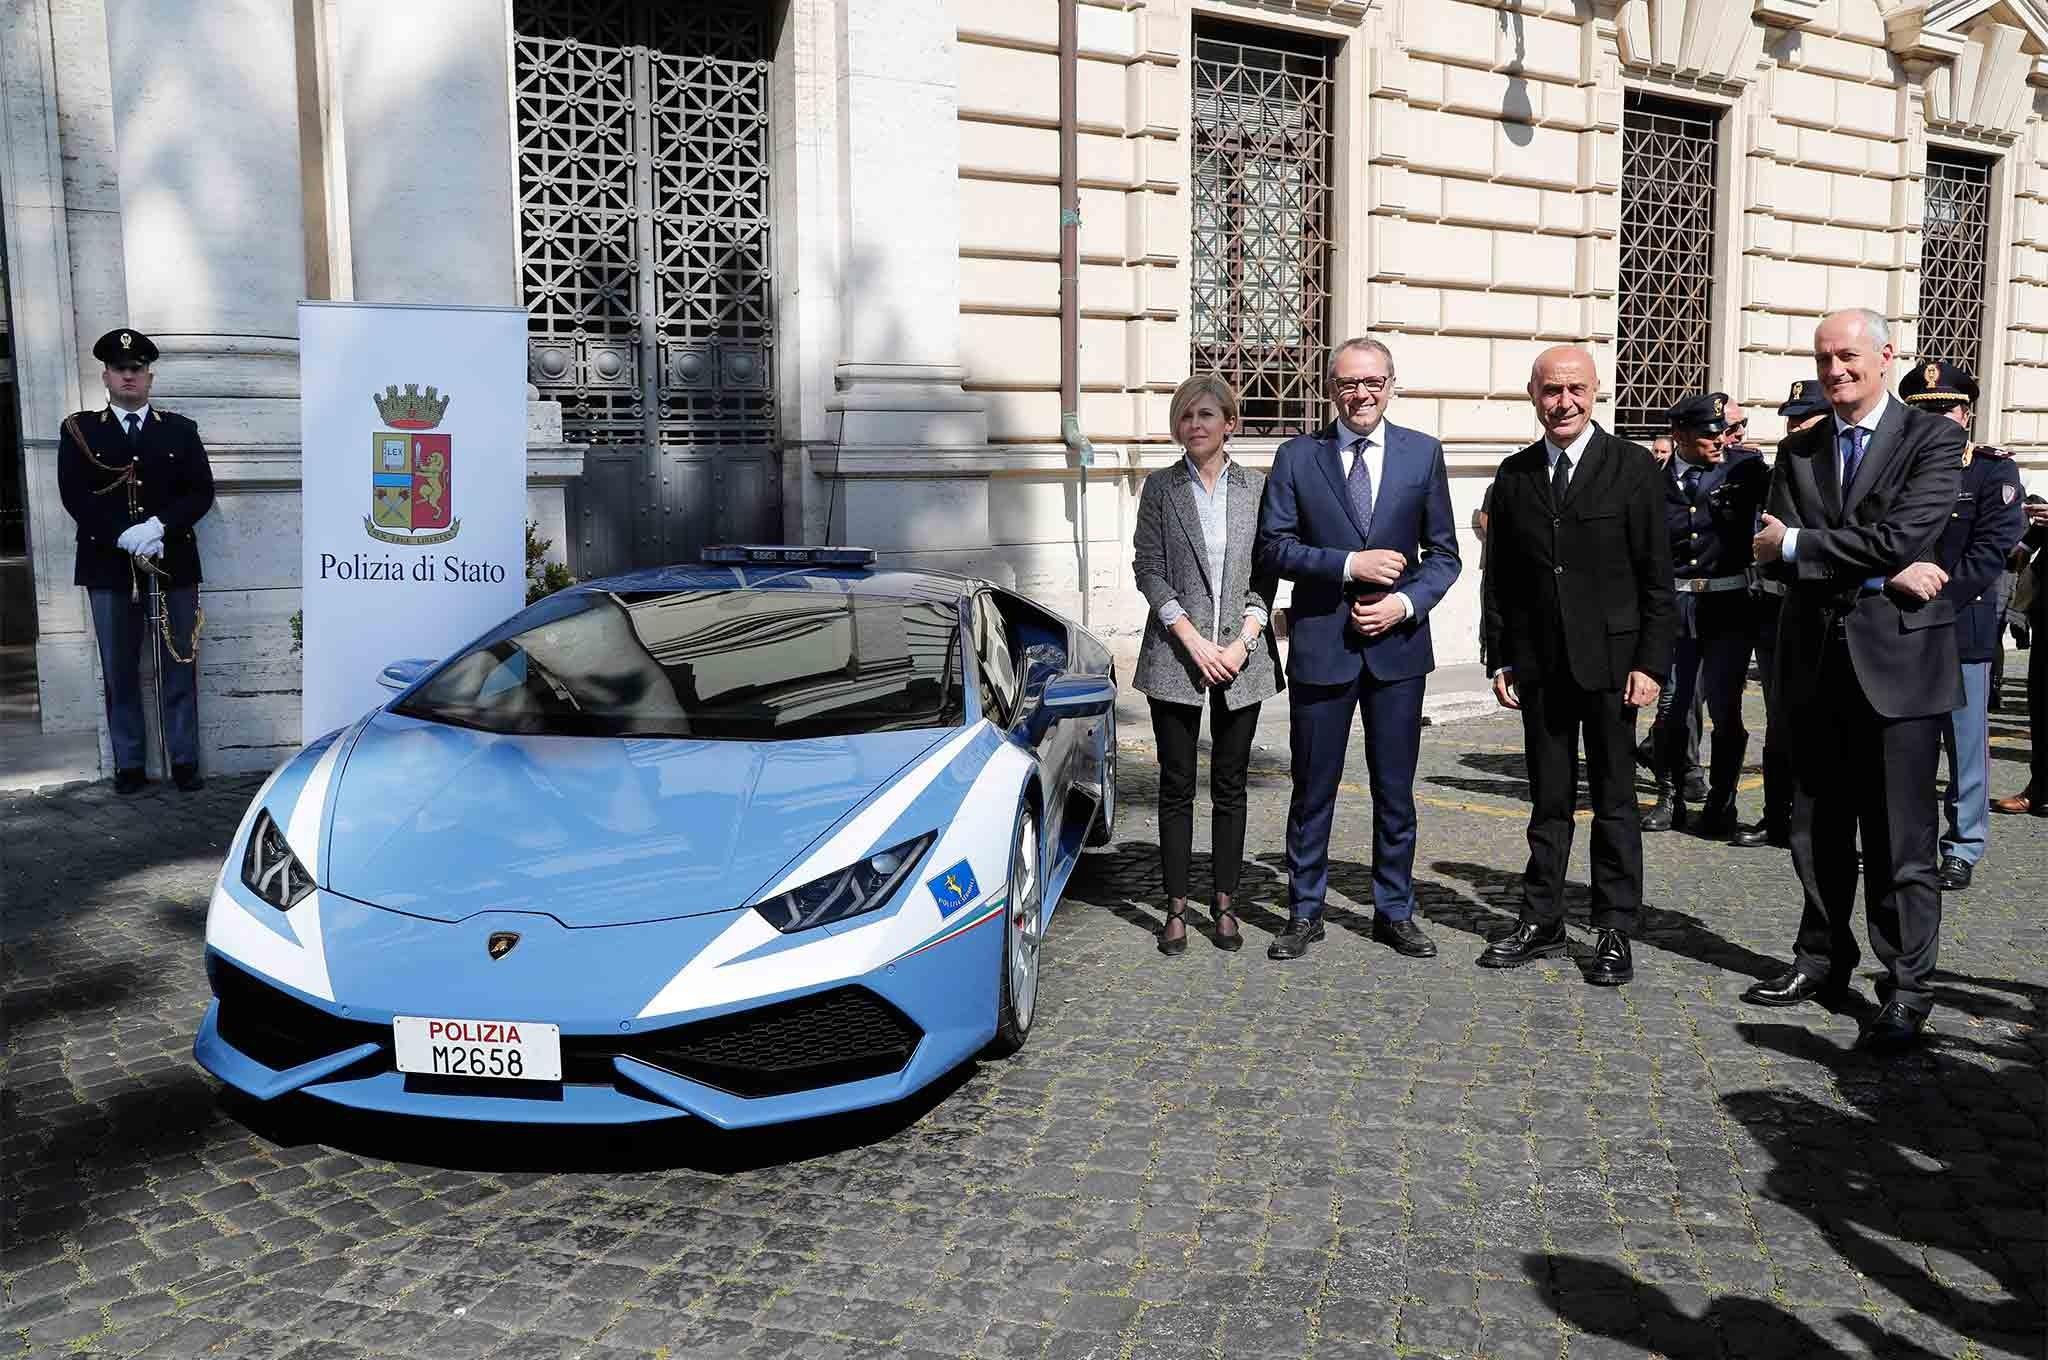 <p><span>Lamborghini Huracan Polizia. Фото: &copy; Lamborghini</span></p>